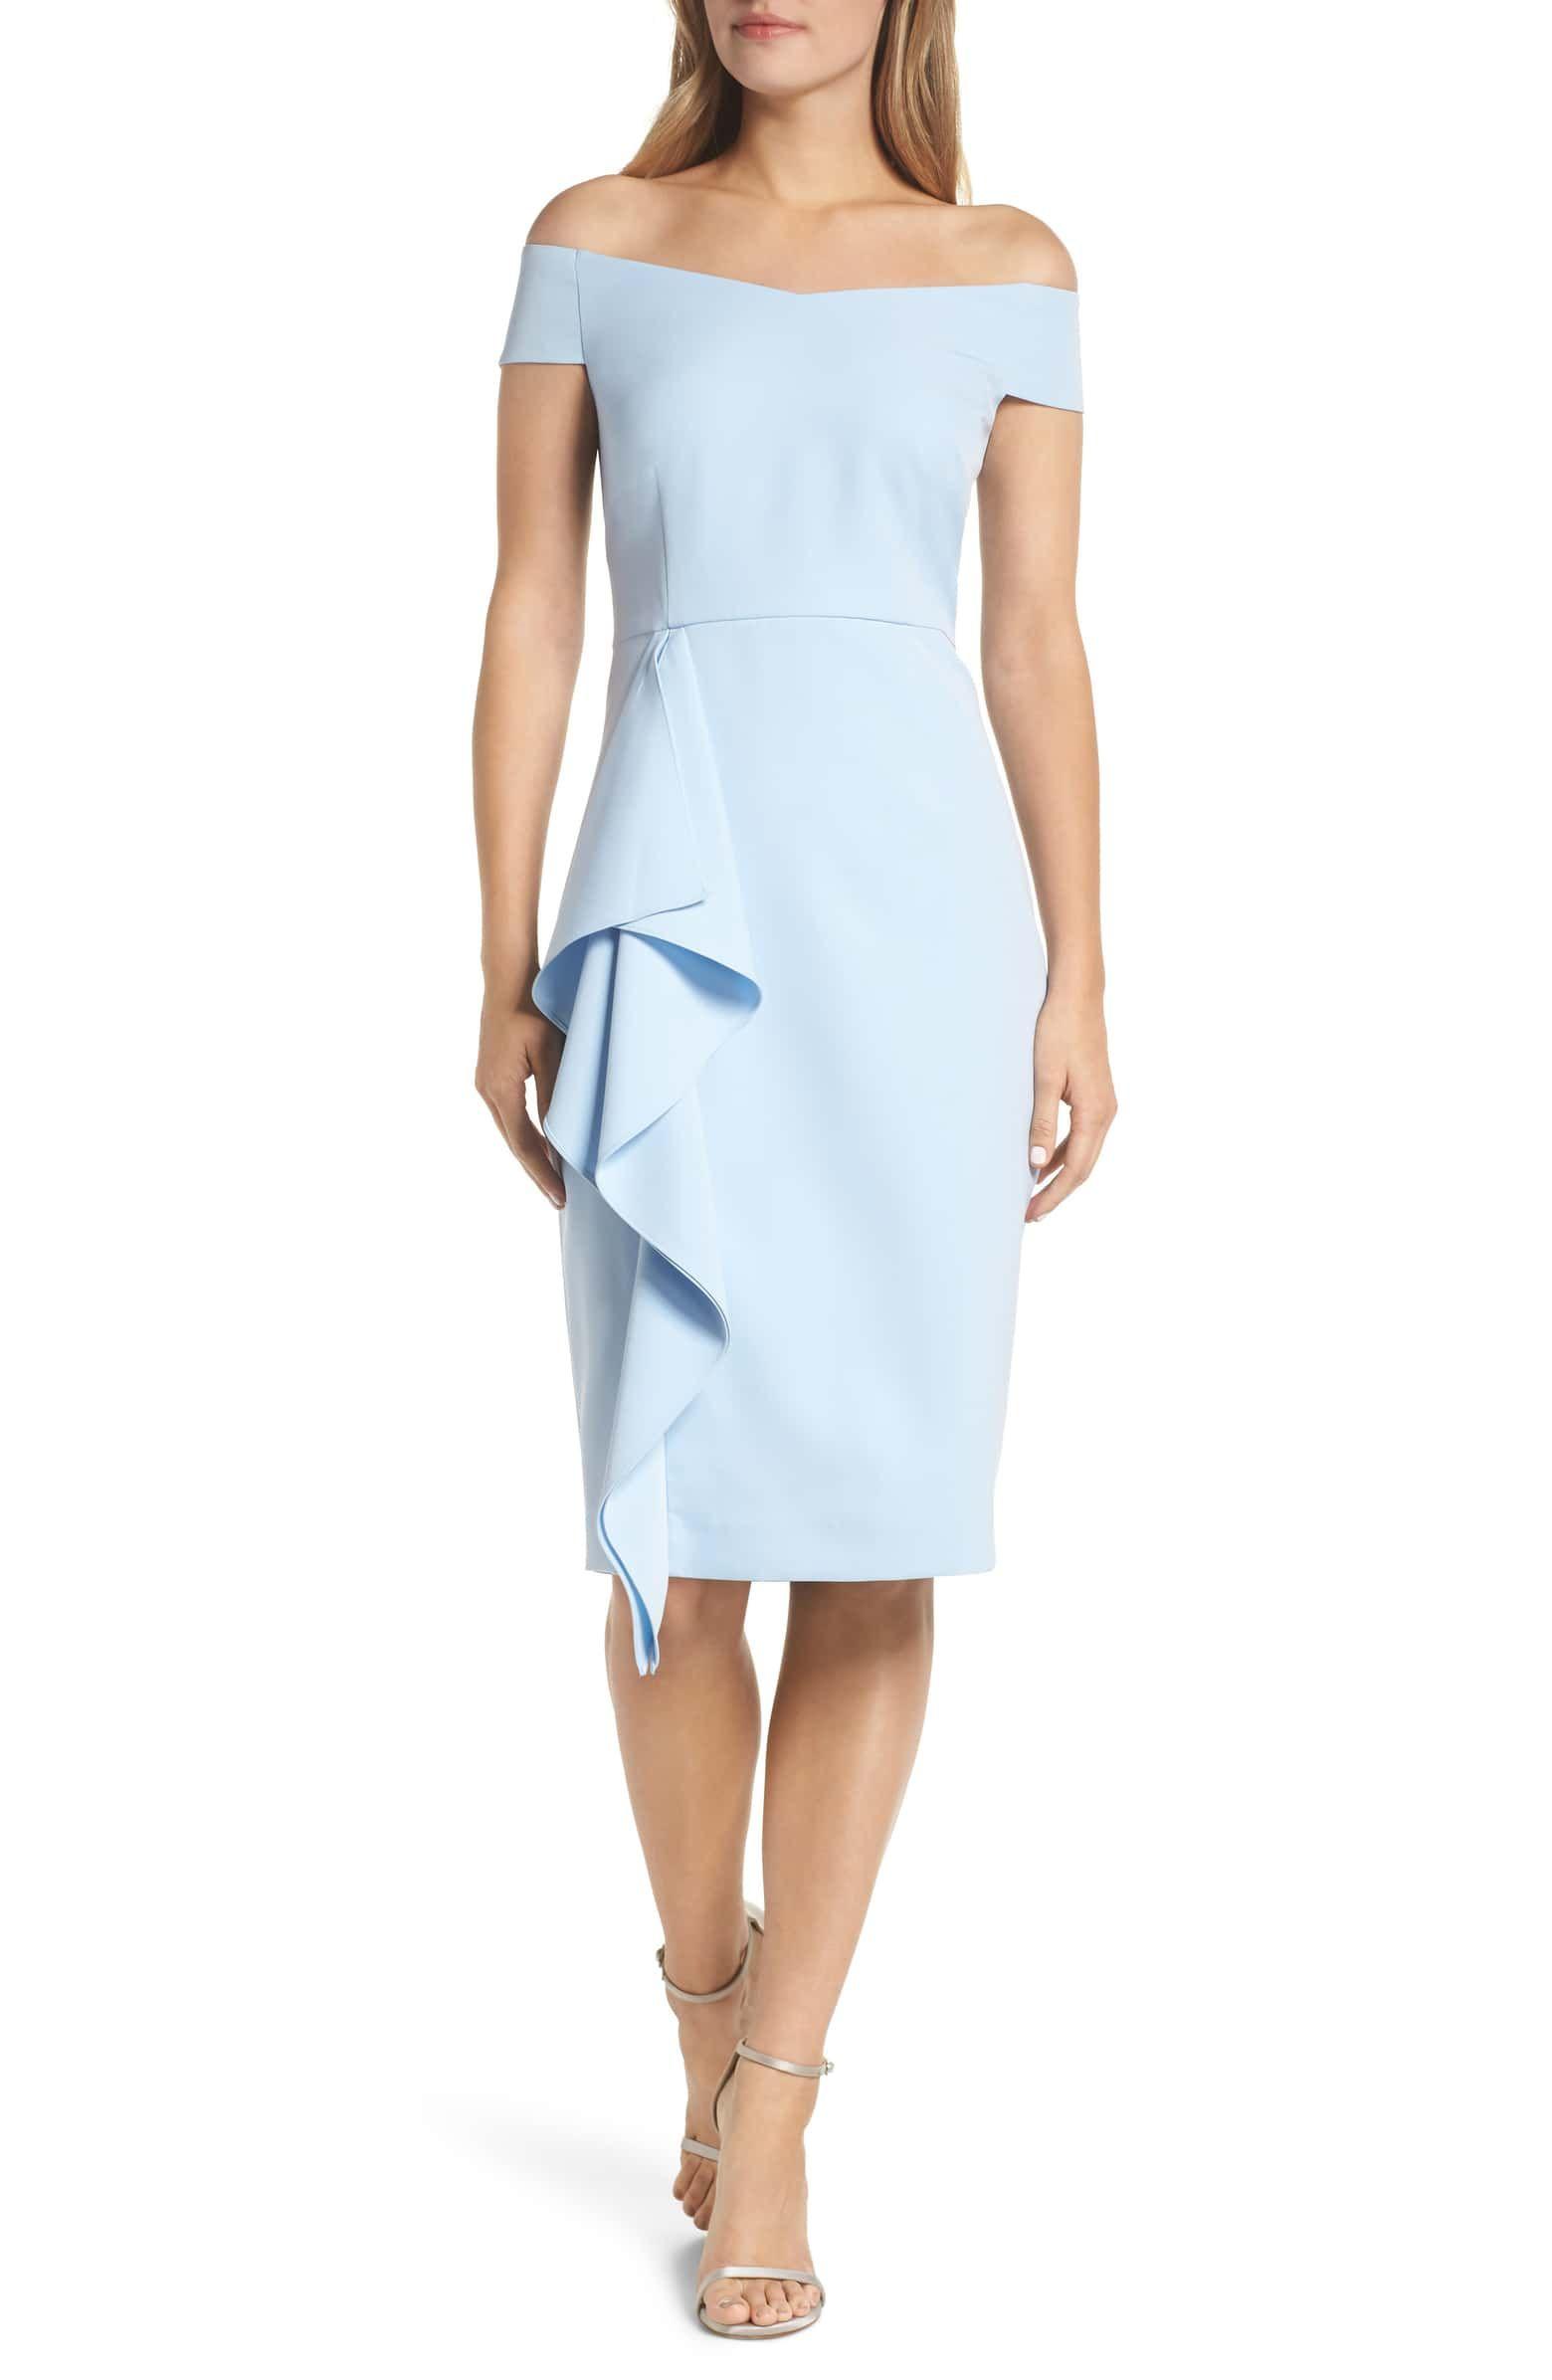 18c3953a1056d VINCE CAMUTO Off the Shoulder Front Ruffle Cocktail Dress, Main, color,  LIGHT BLUE